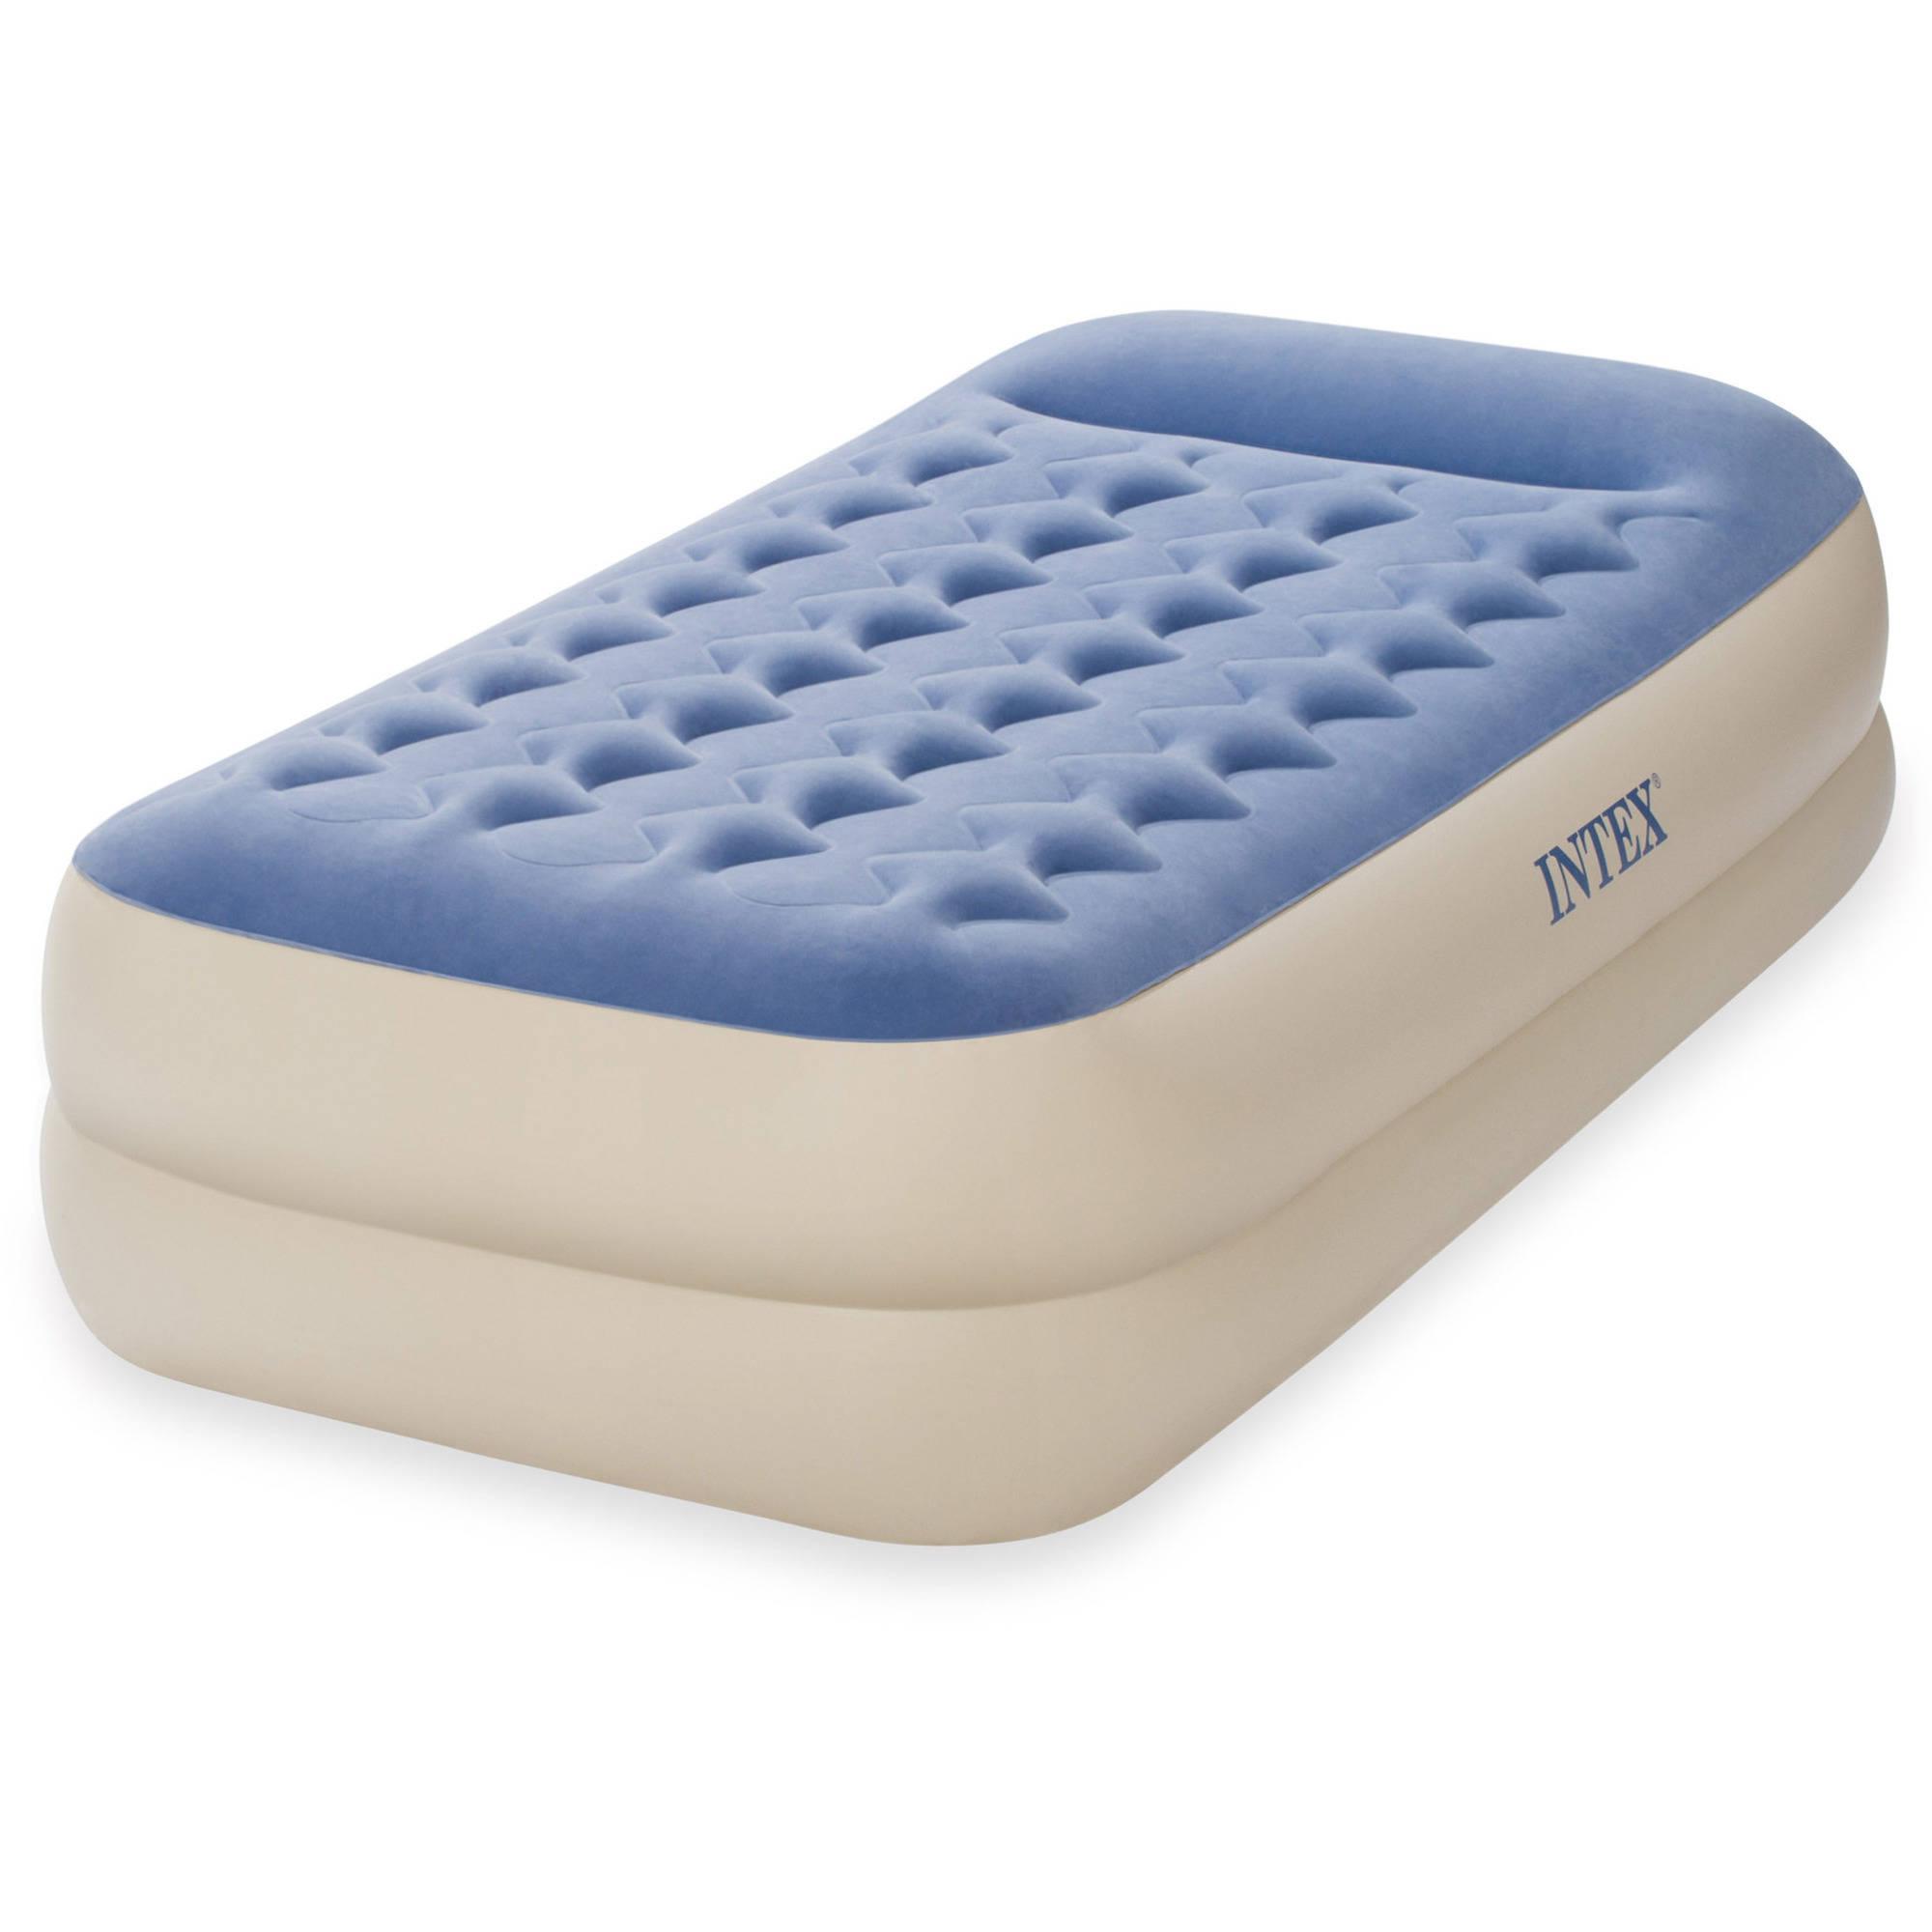 "Intex Twin 18"" Dura-Beam Standard Raised Pillow Rest Airbed Mattress"